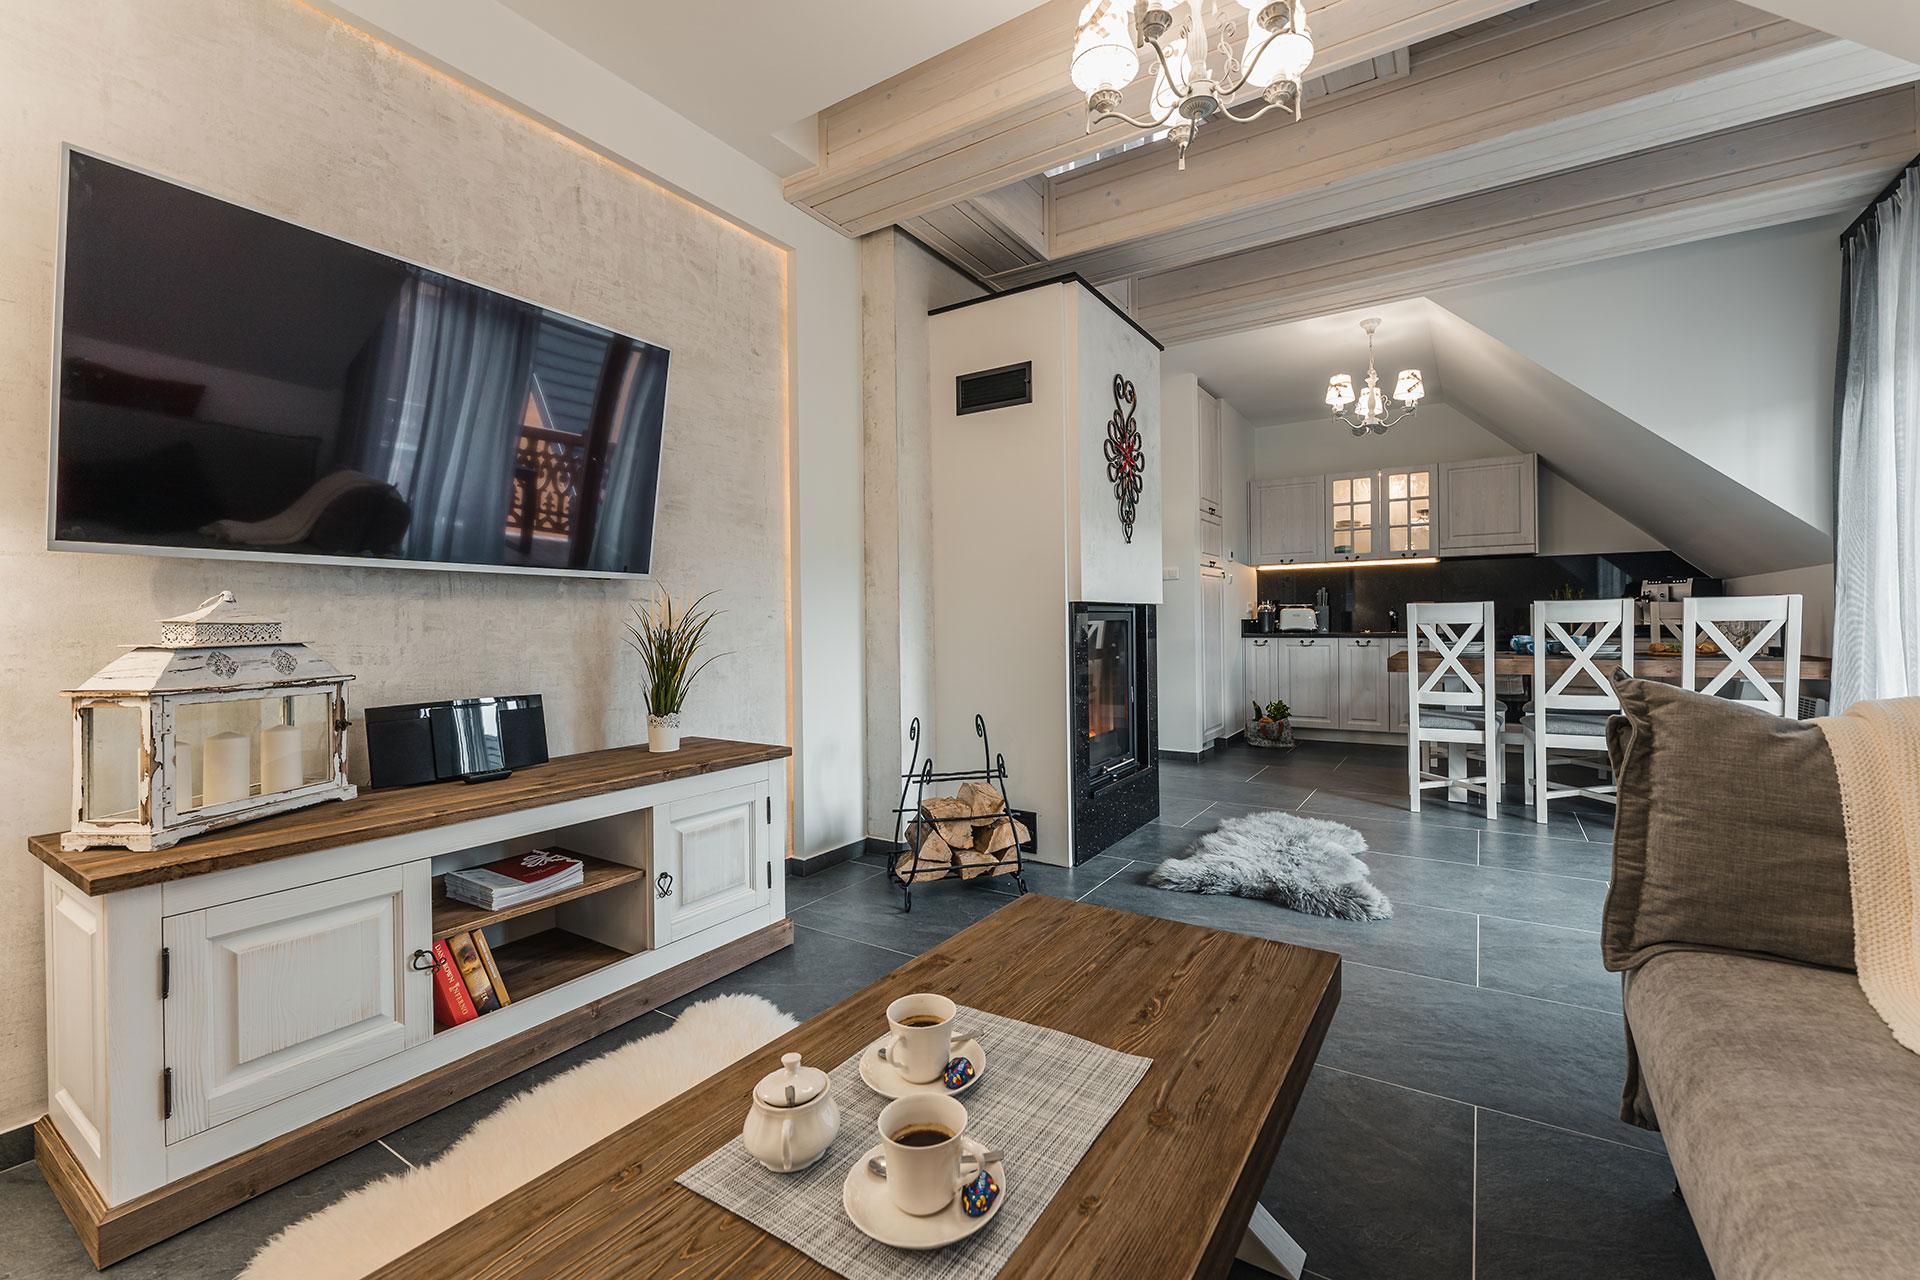 Apartament szafir - luksus w górach